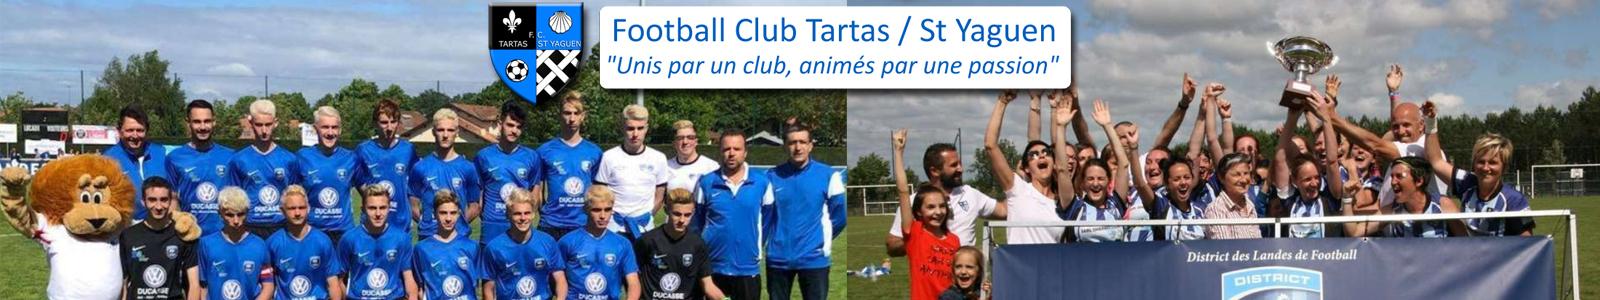 Football Club Tartas St Yaguen : site officiel du club de foot de TARTAS - footeo